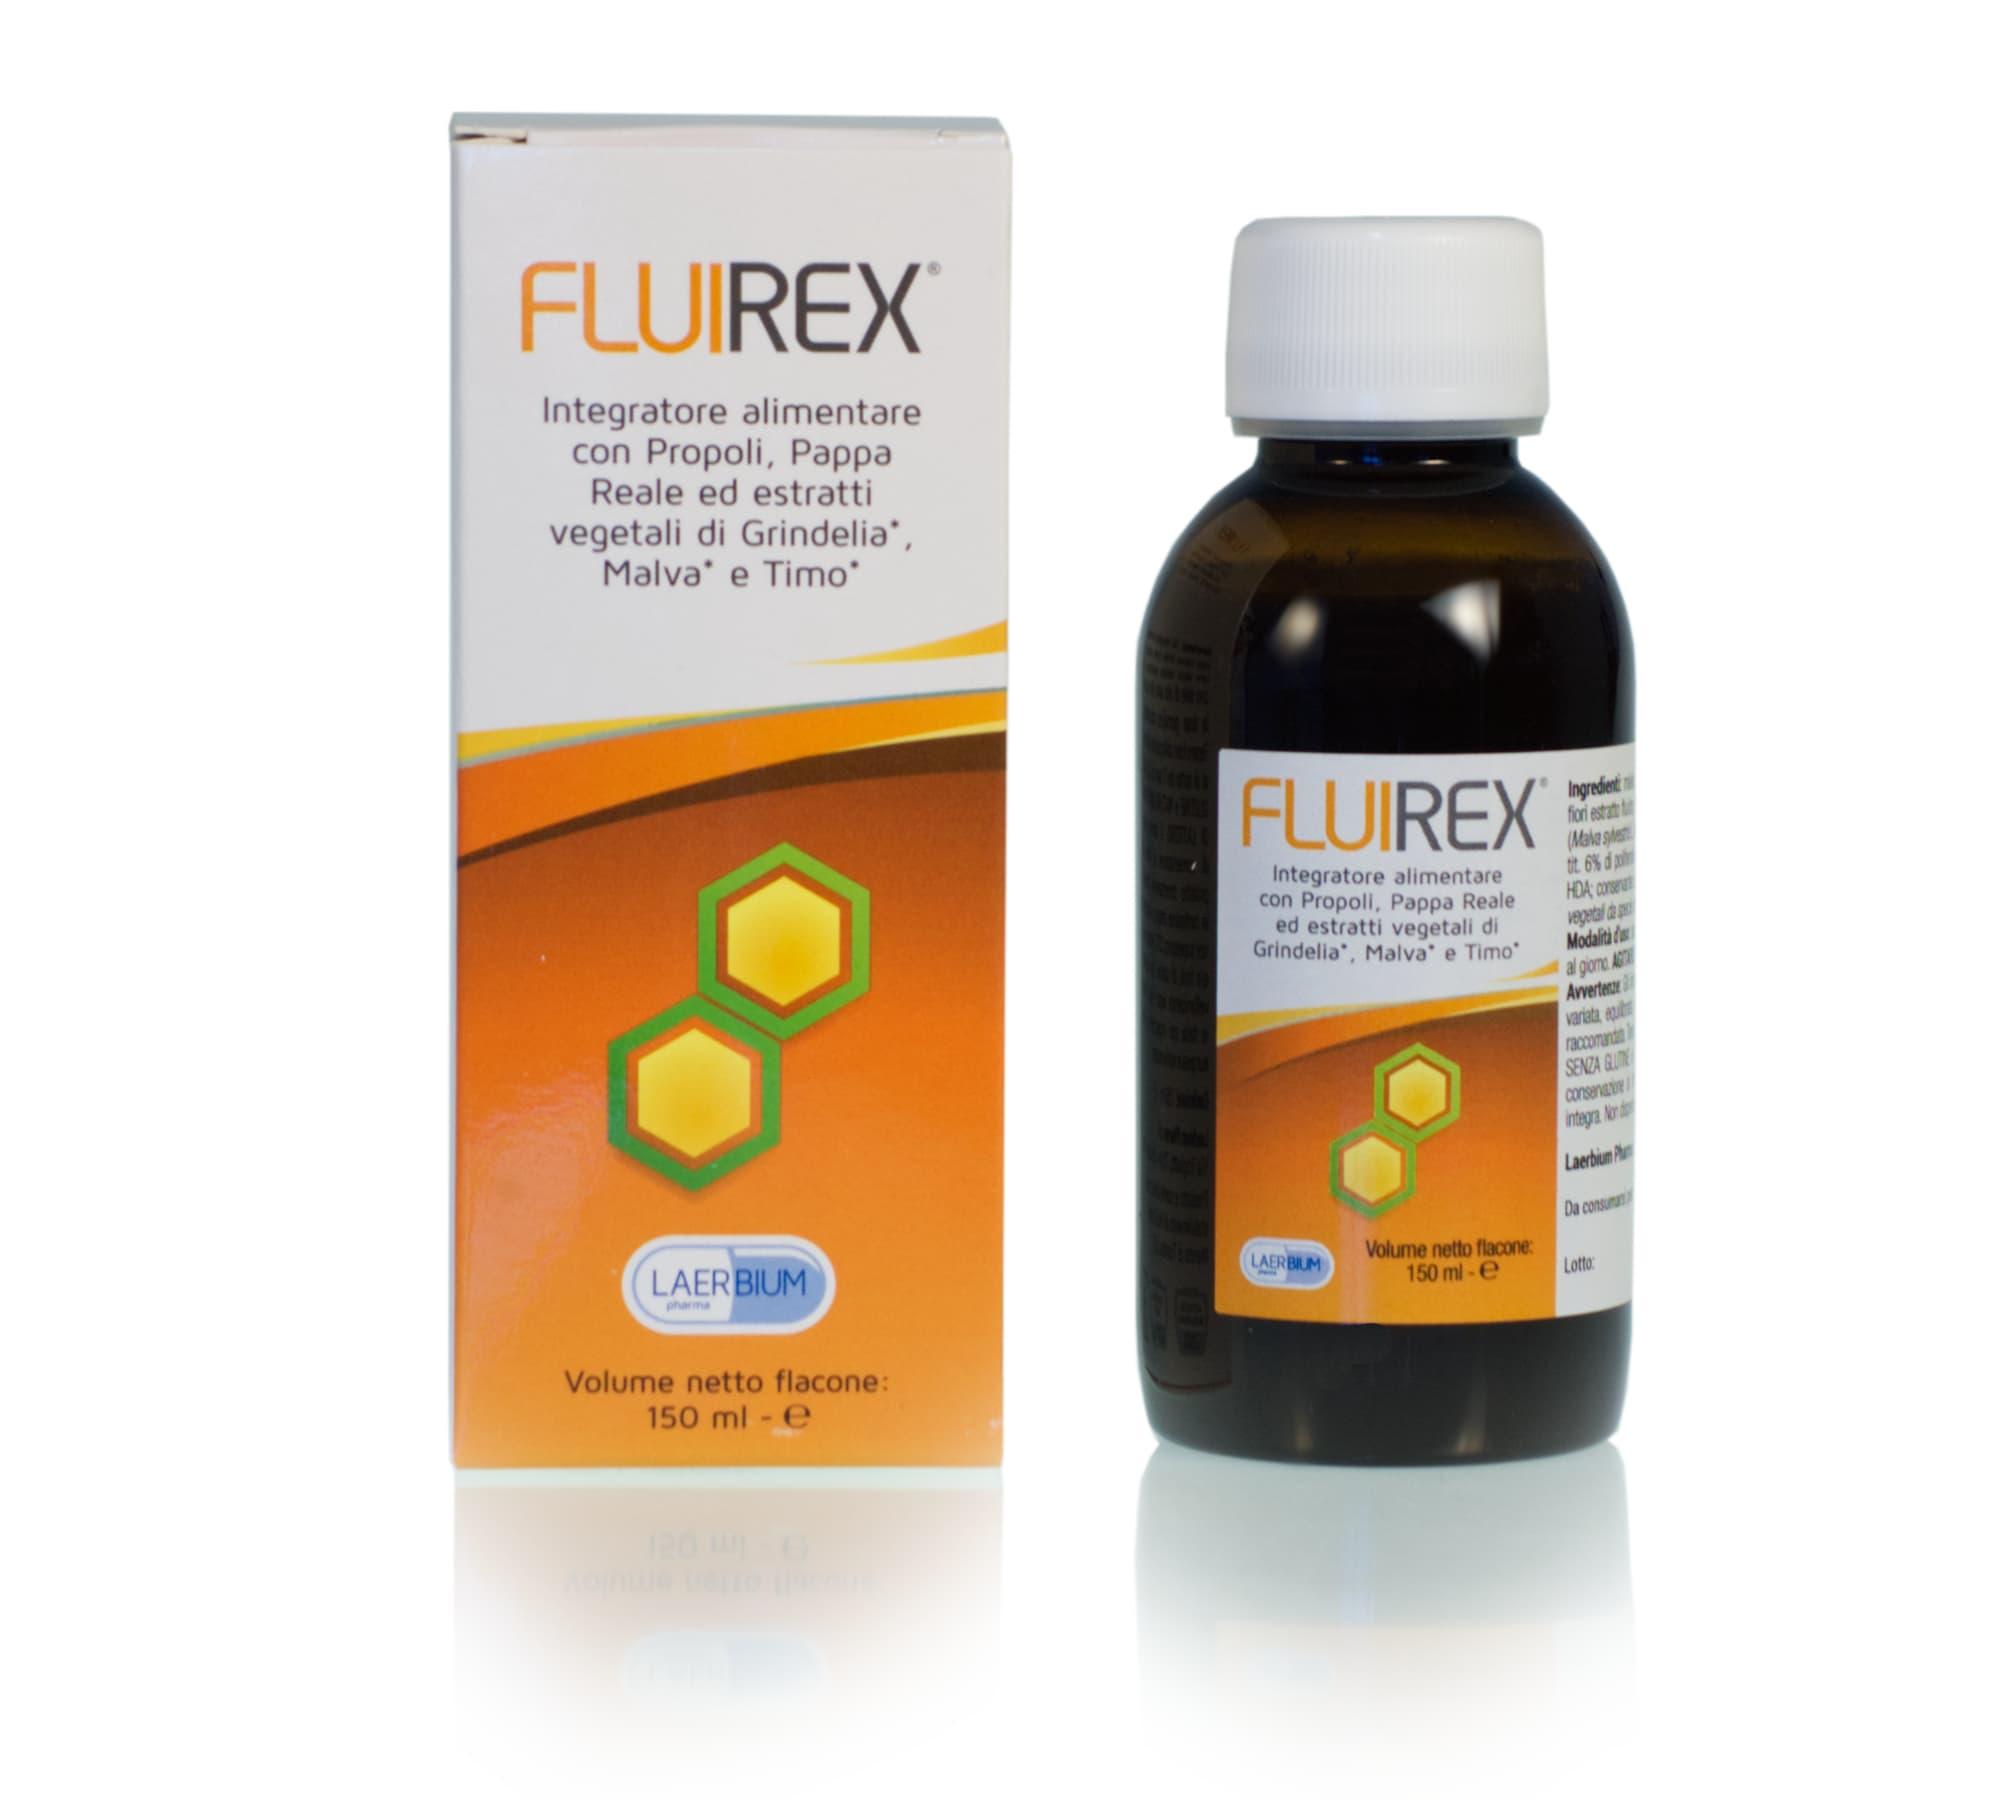 Fluirex